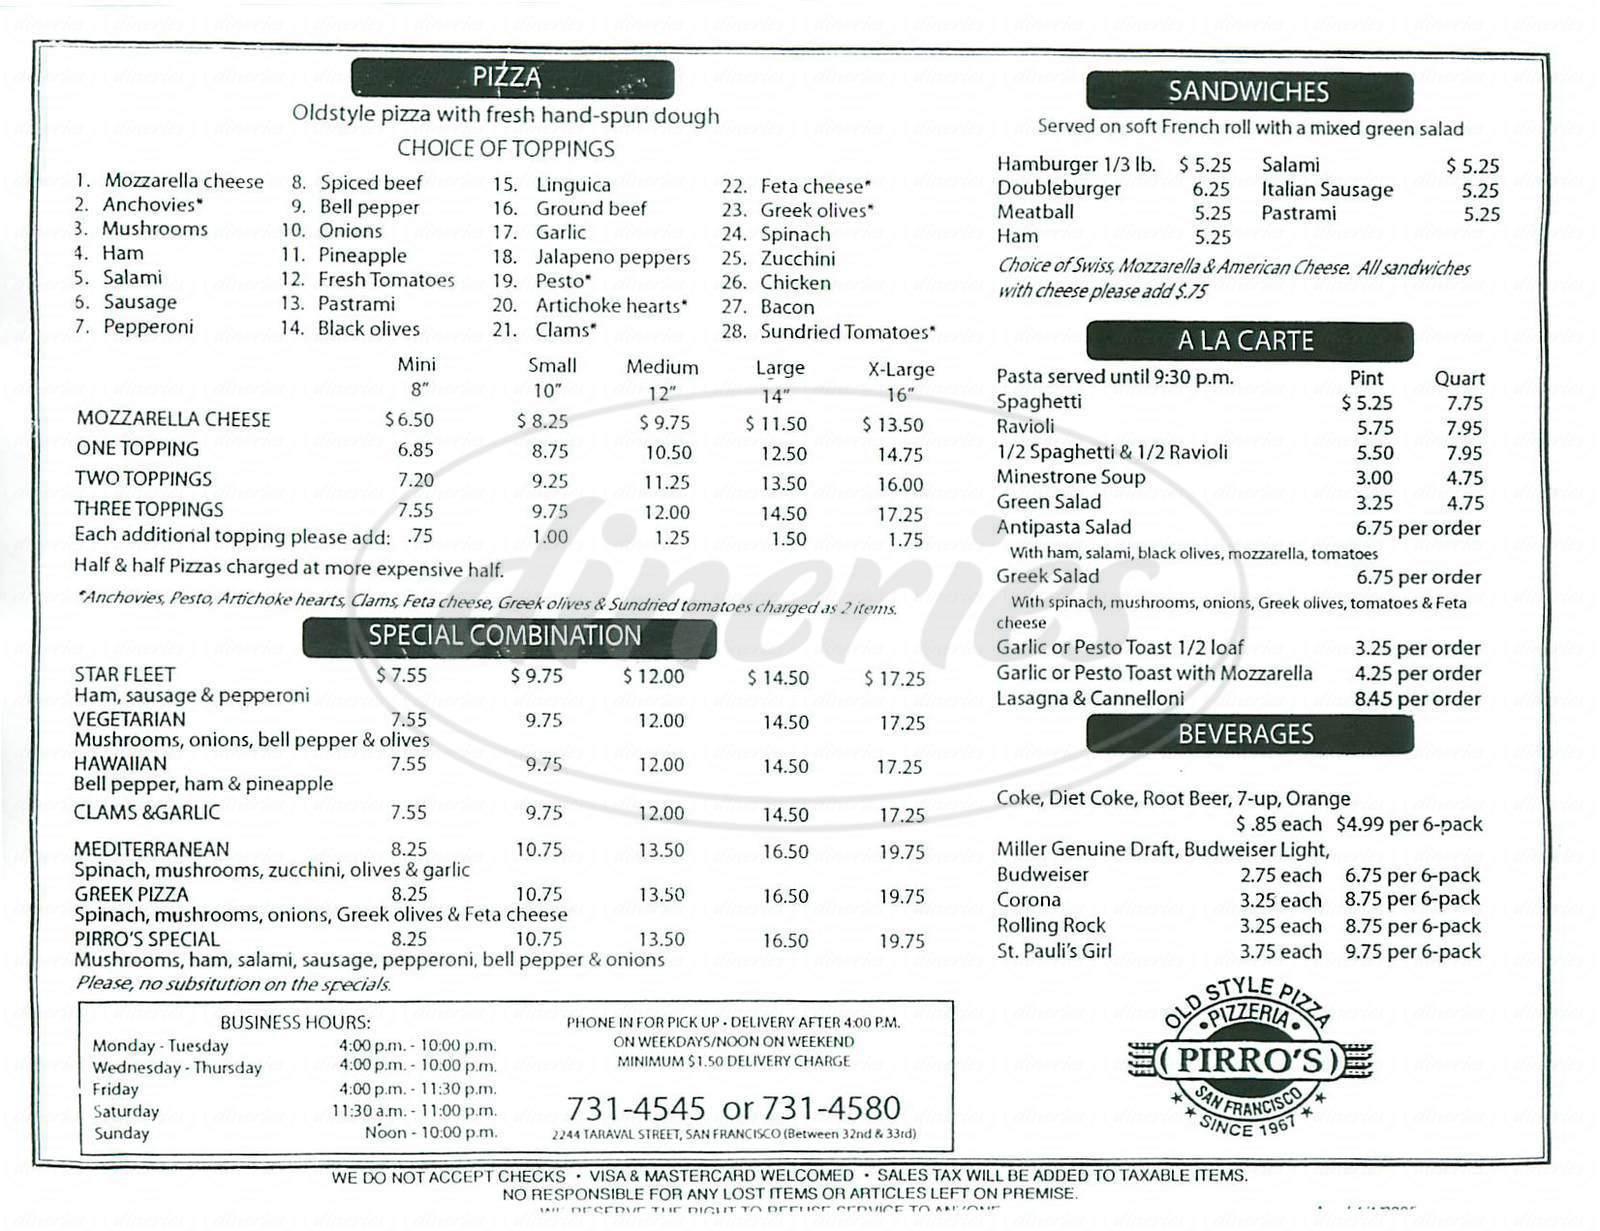 menu for Pirro's Pizzeria